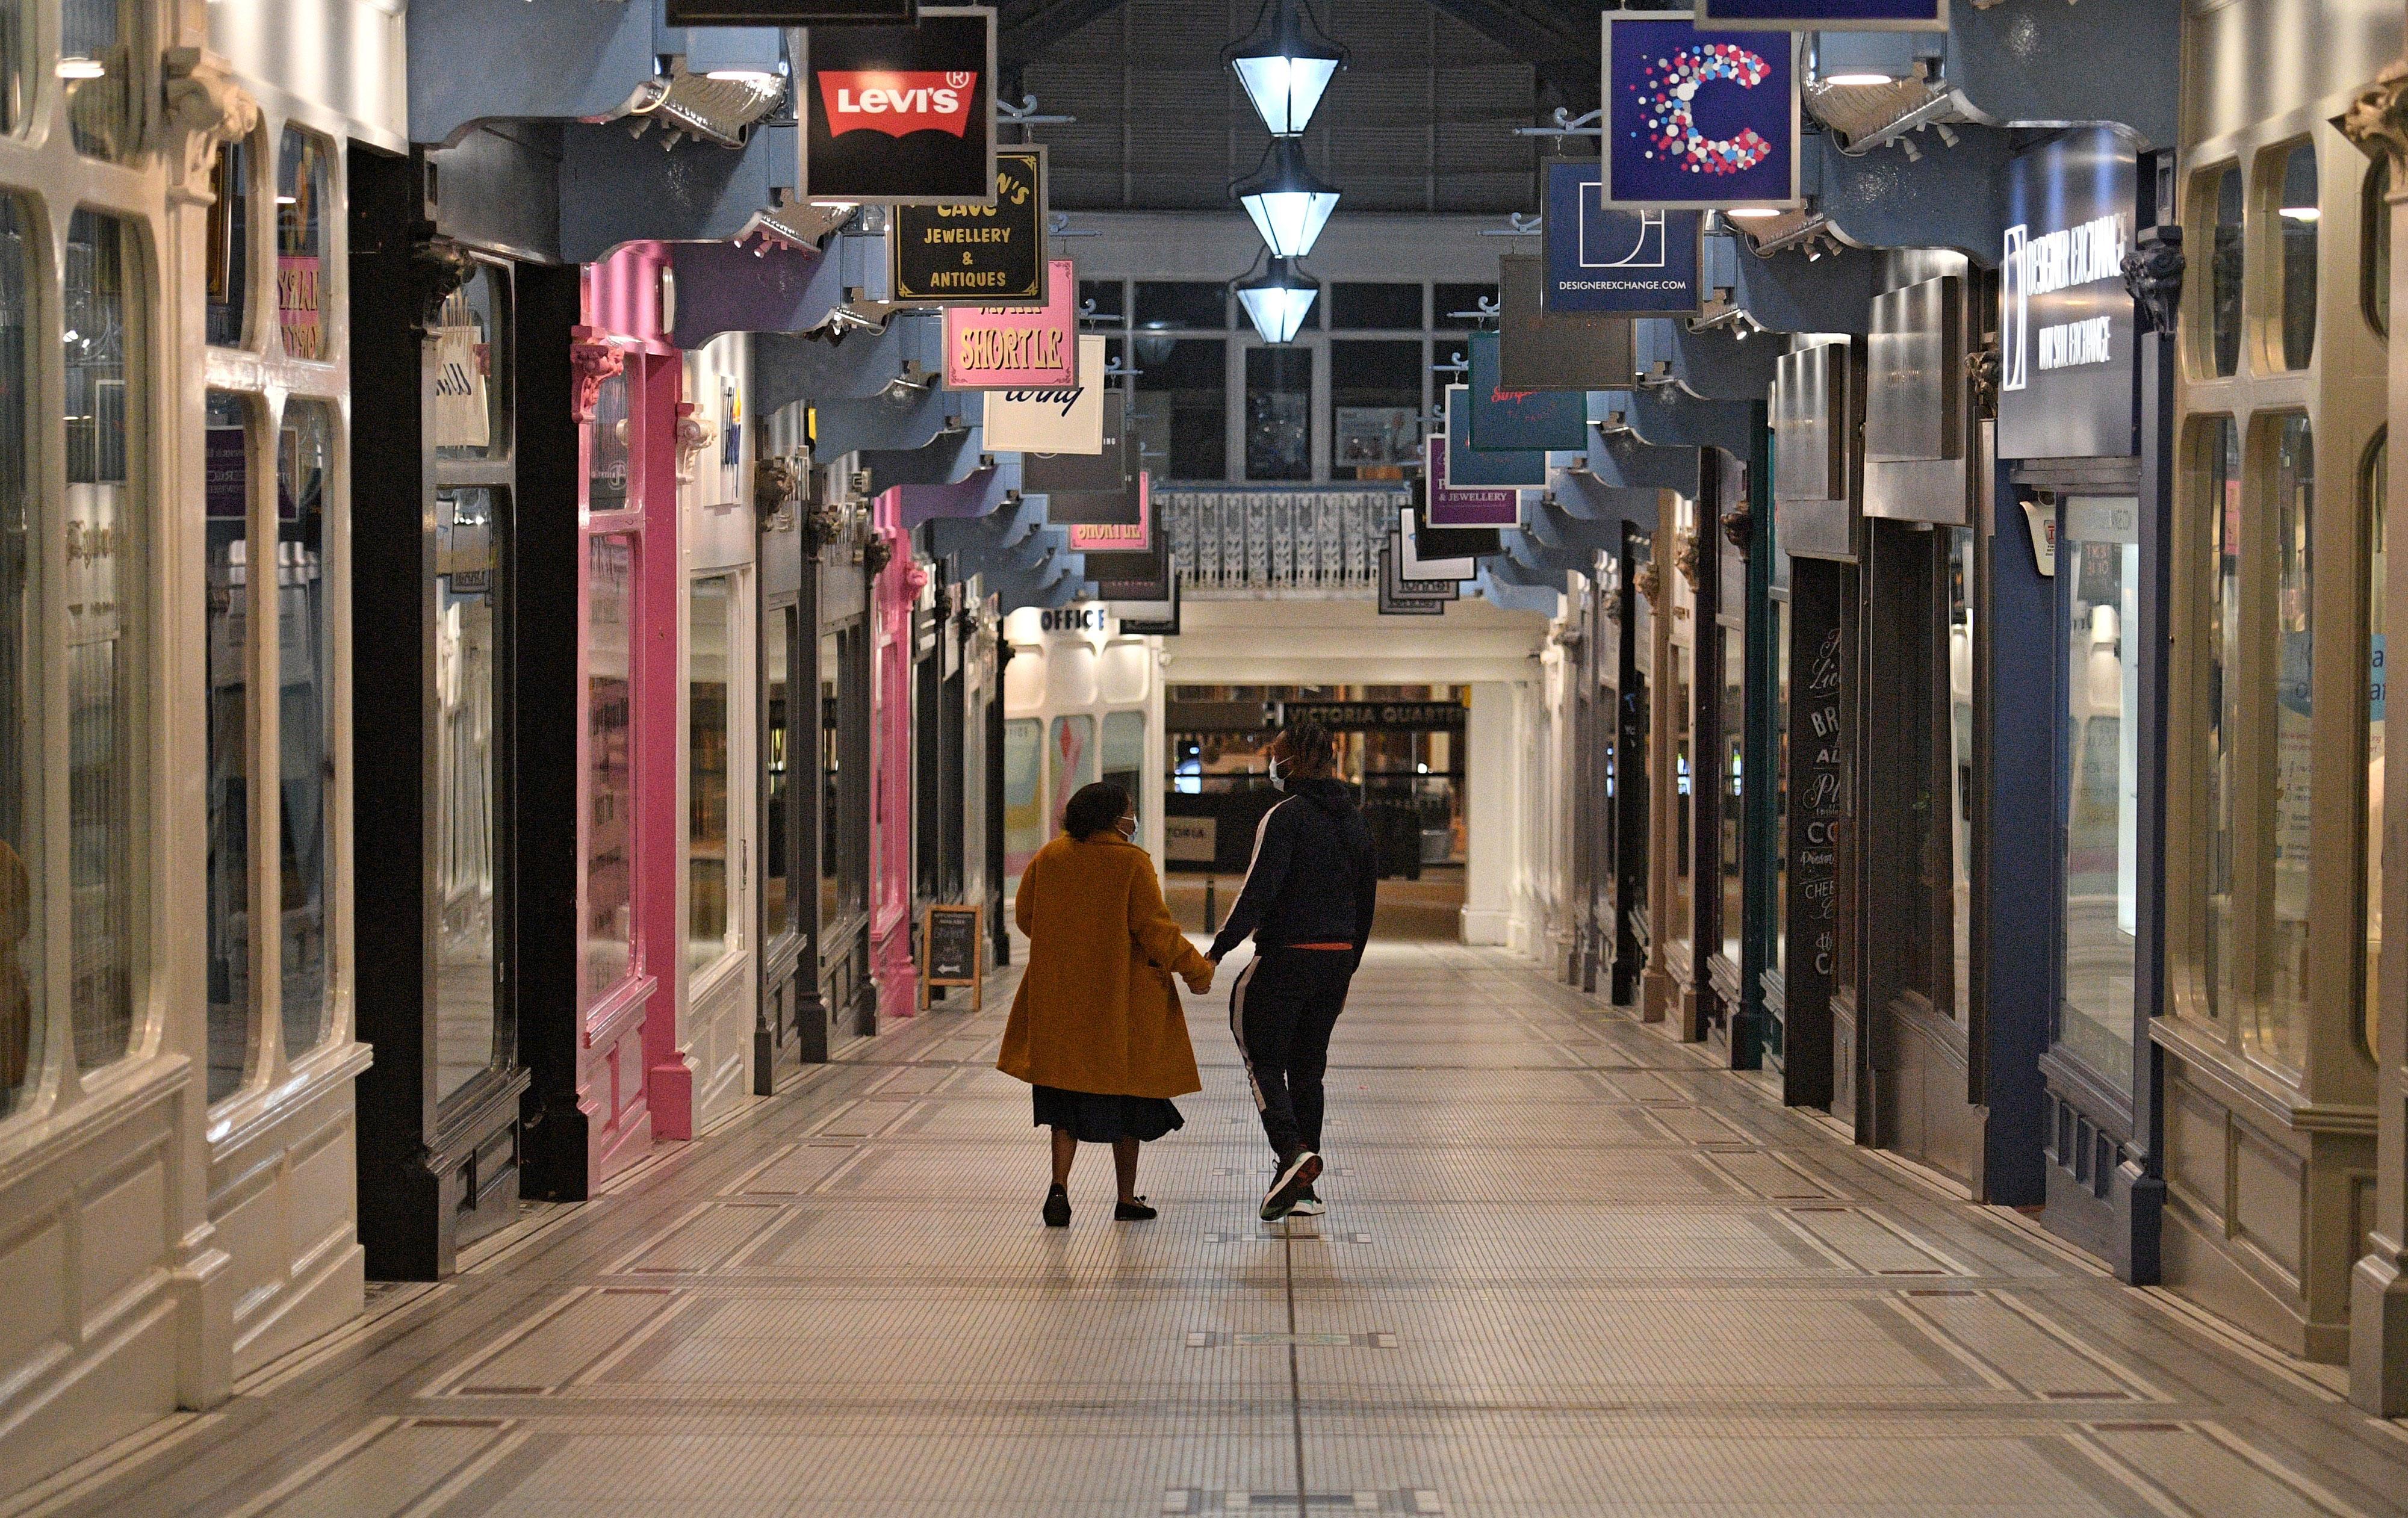 People walk through an empty shopping center in Leeds, England, on November 4.